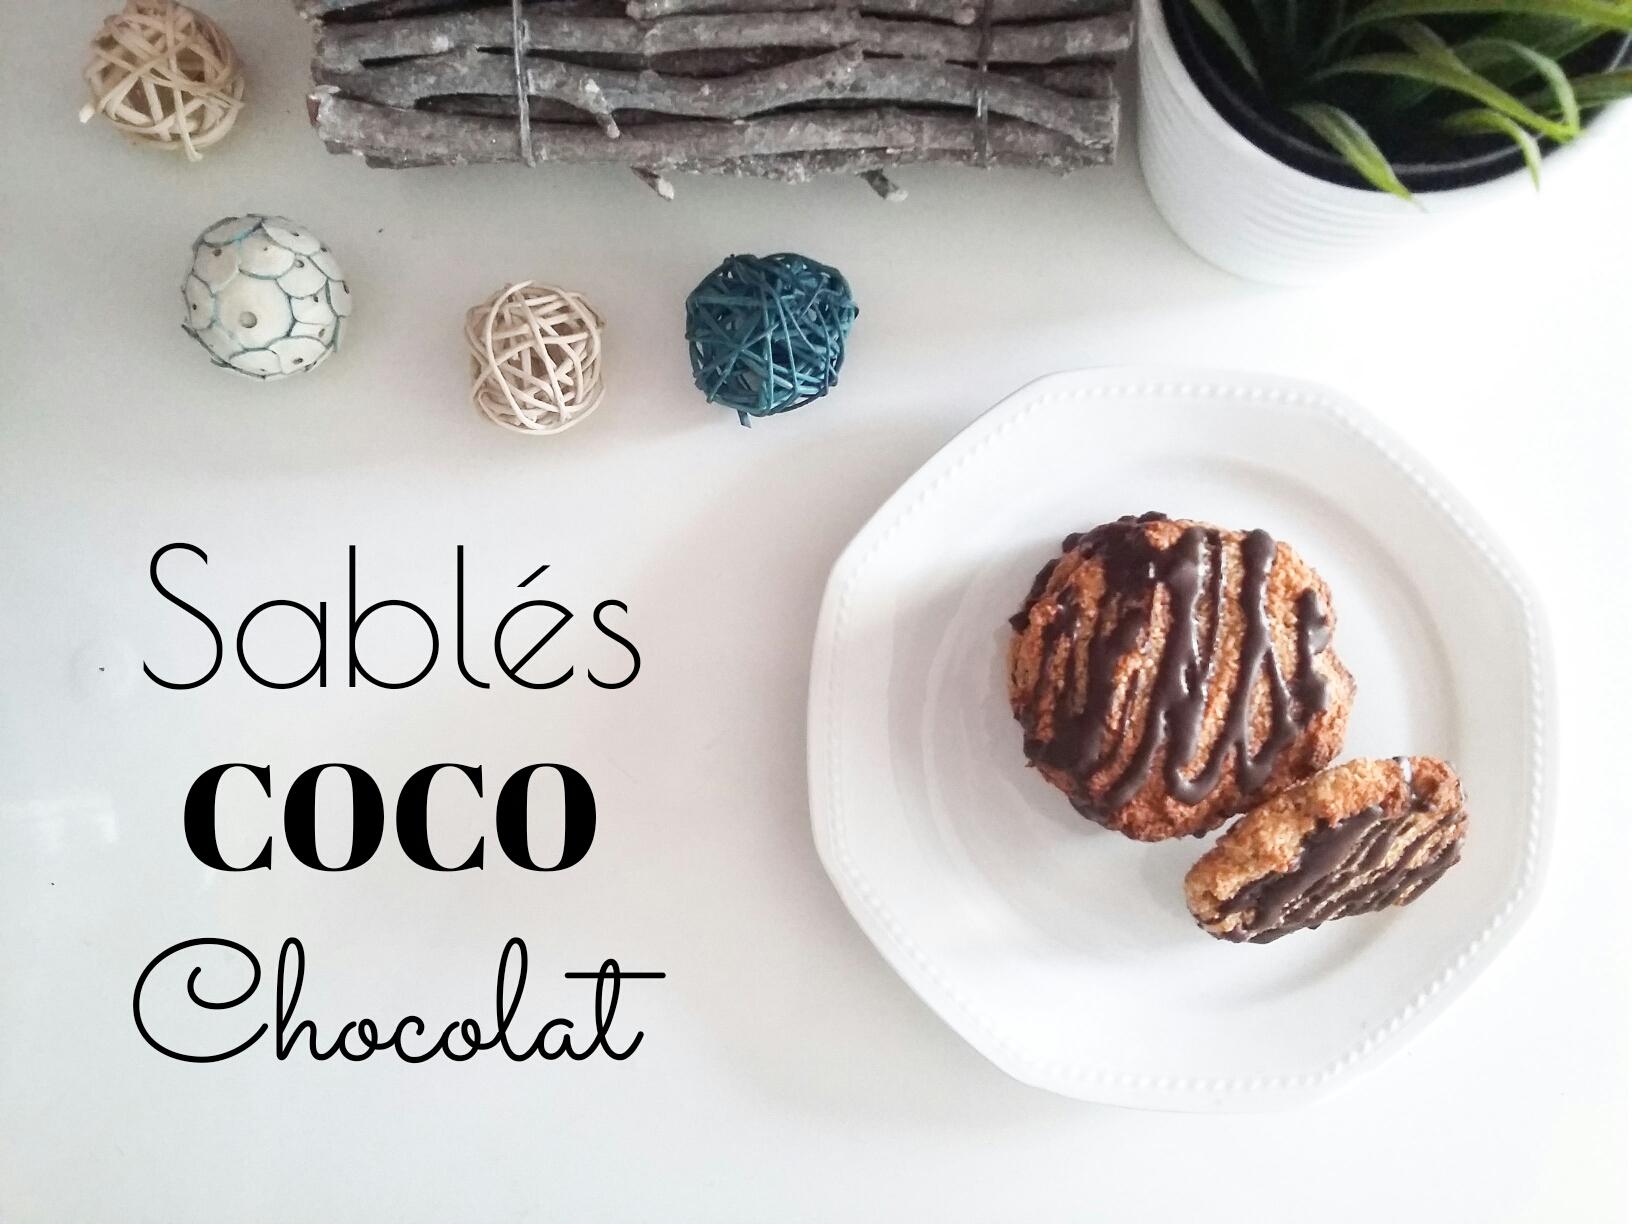 Sablés coco chocolat sans gluten à tomber